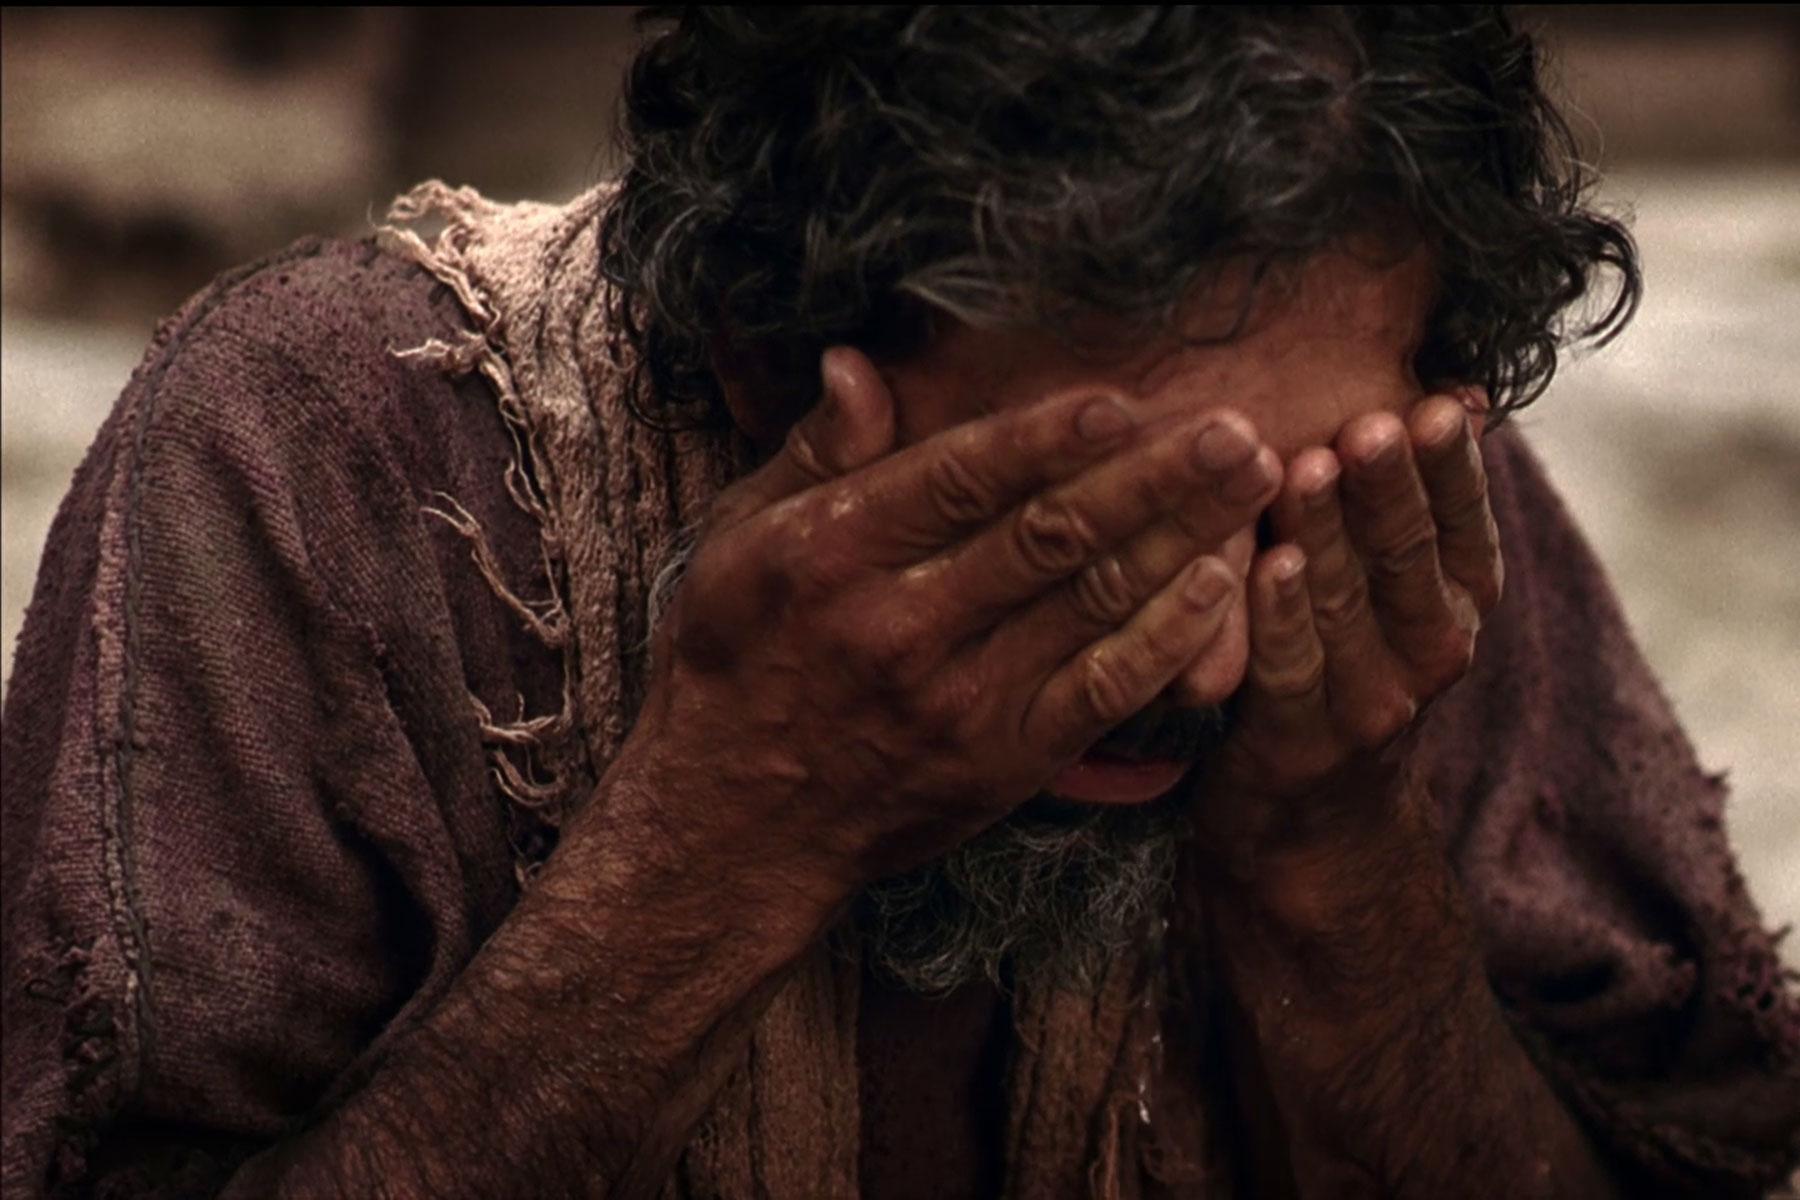 Blind Man Sees More than Pharisees